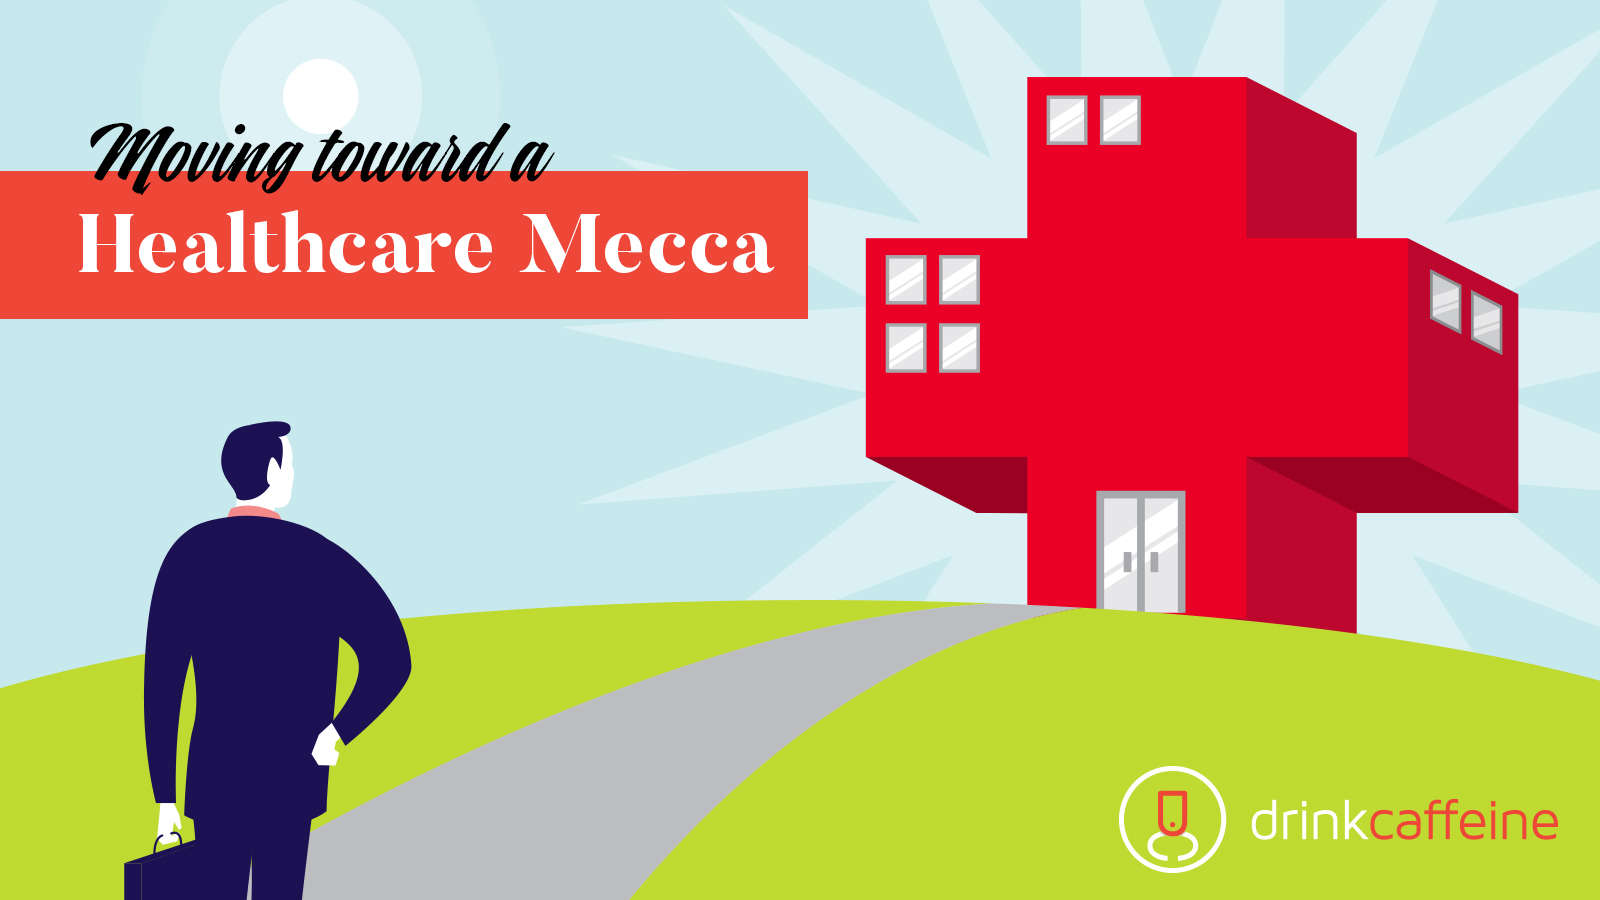 Moving toward a Healthcare Mecca blog image